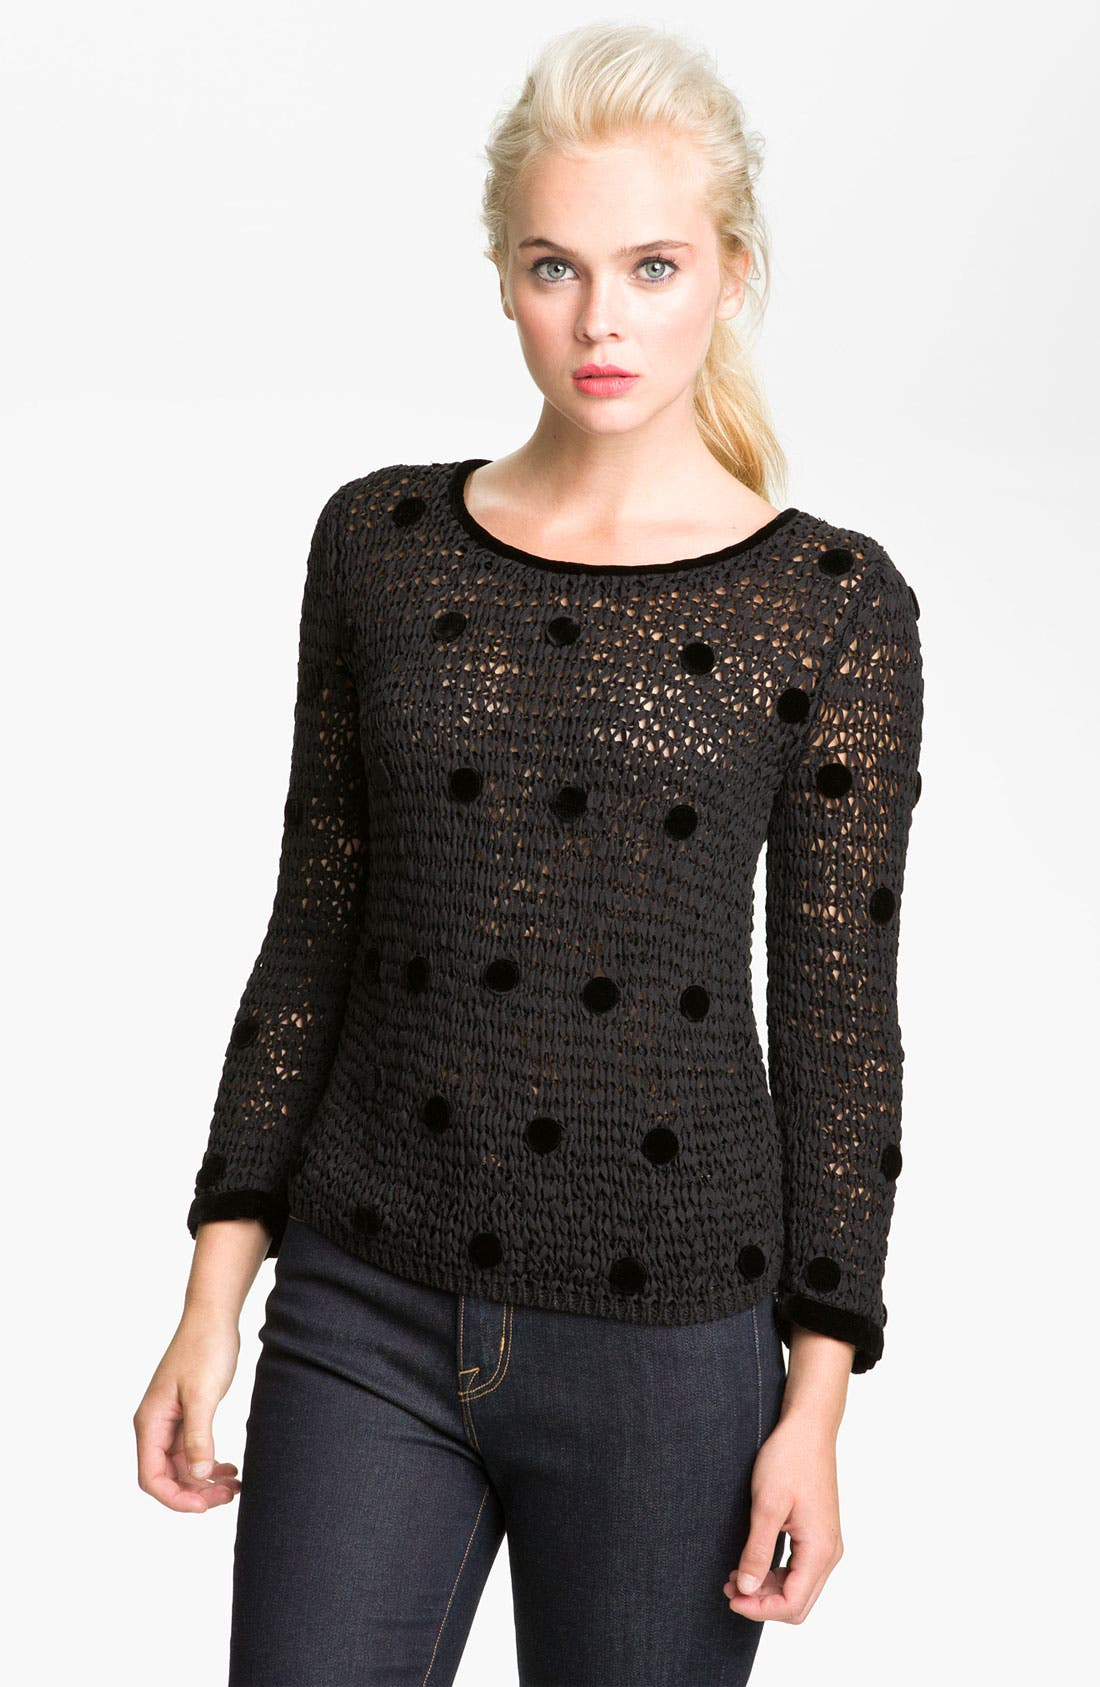 Alternate Image 1 Selected - MARC BY MARC JACOBS 'Koyla' Polka Dot Sweater